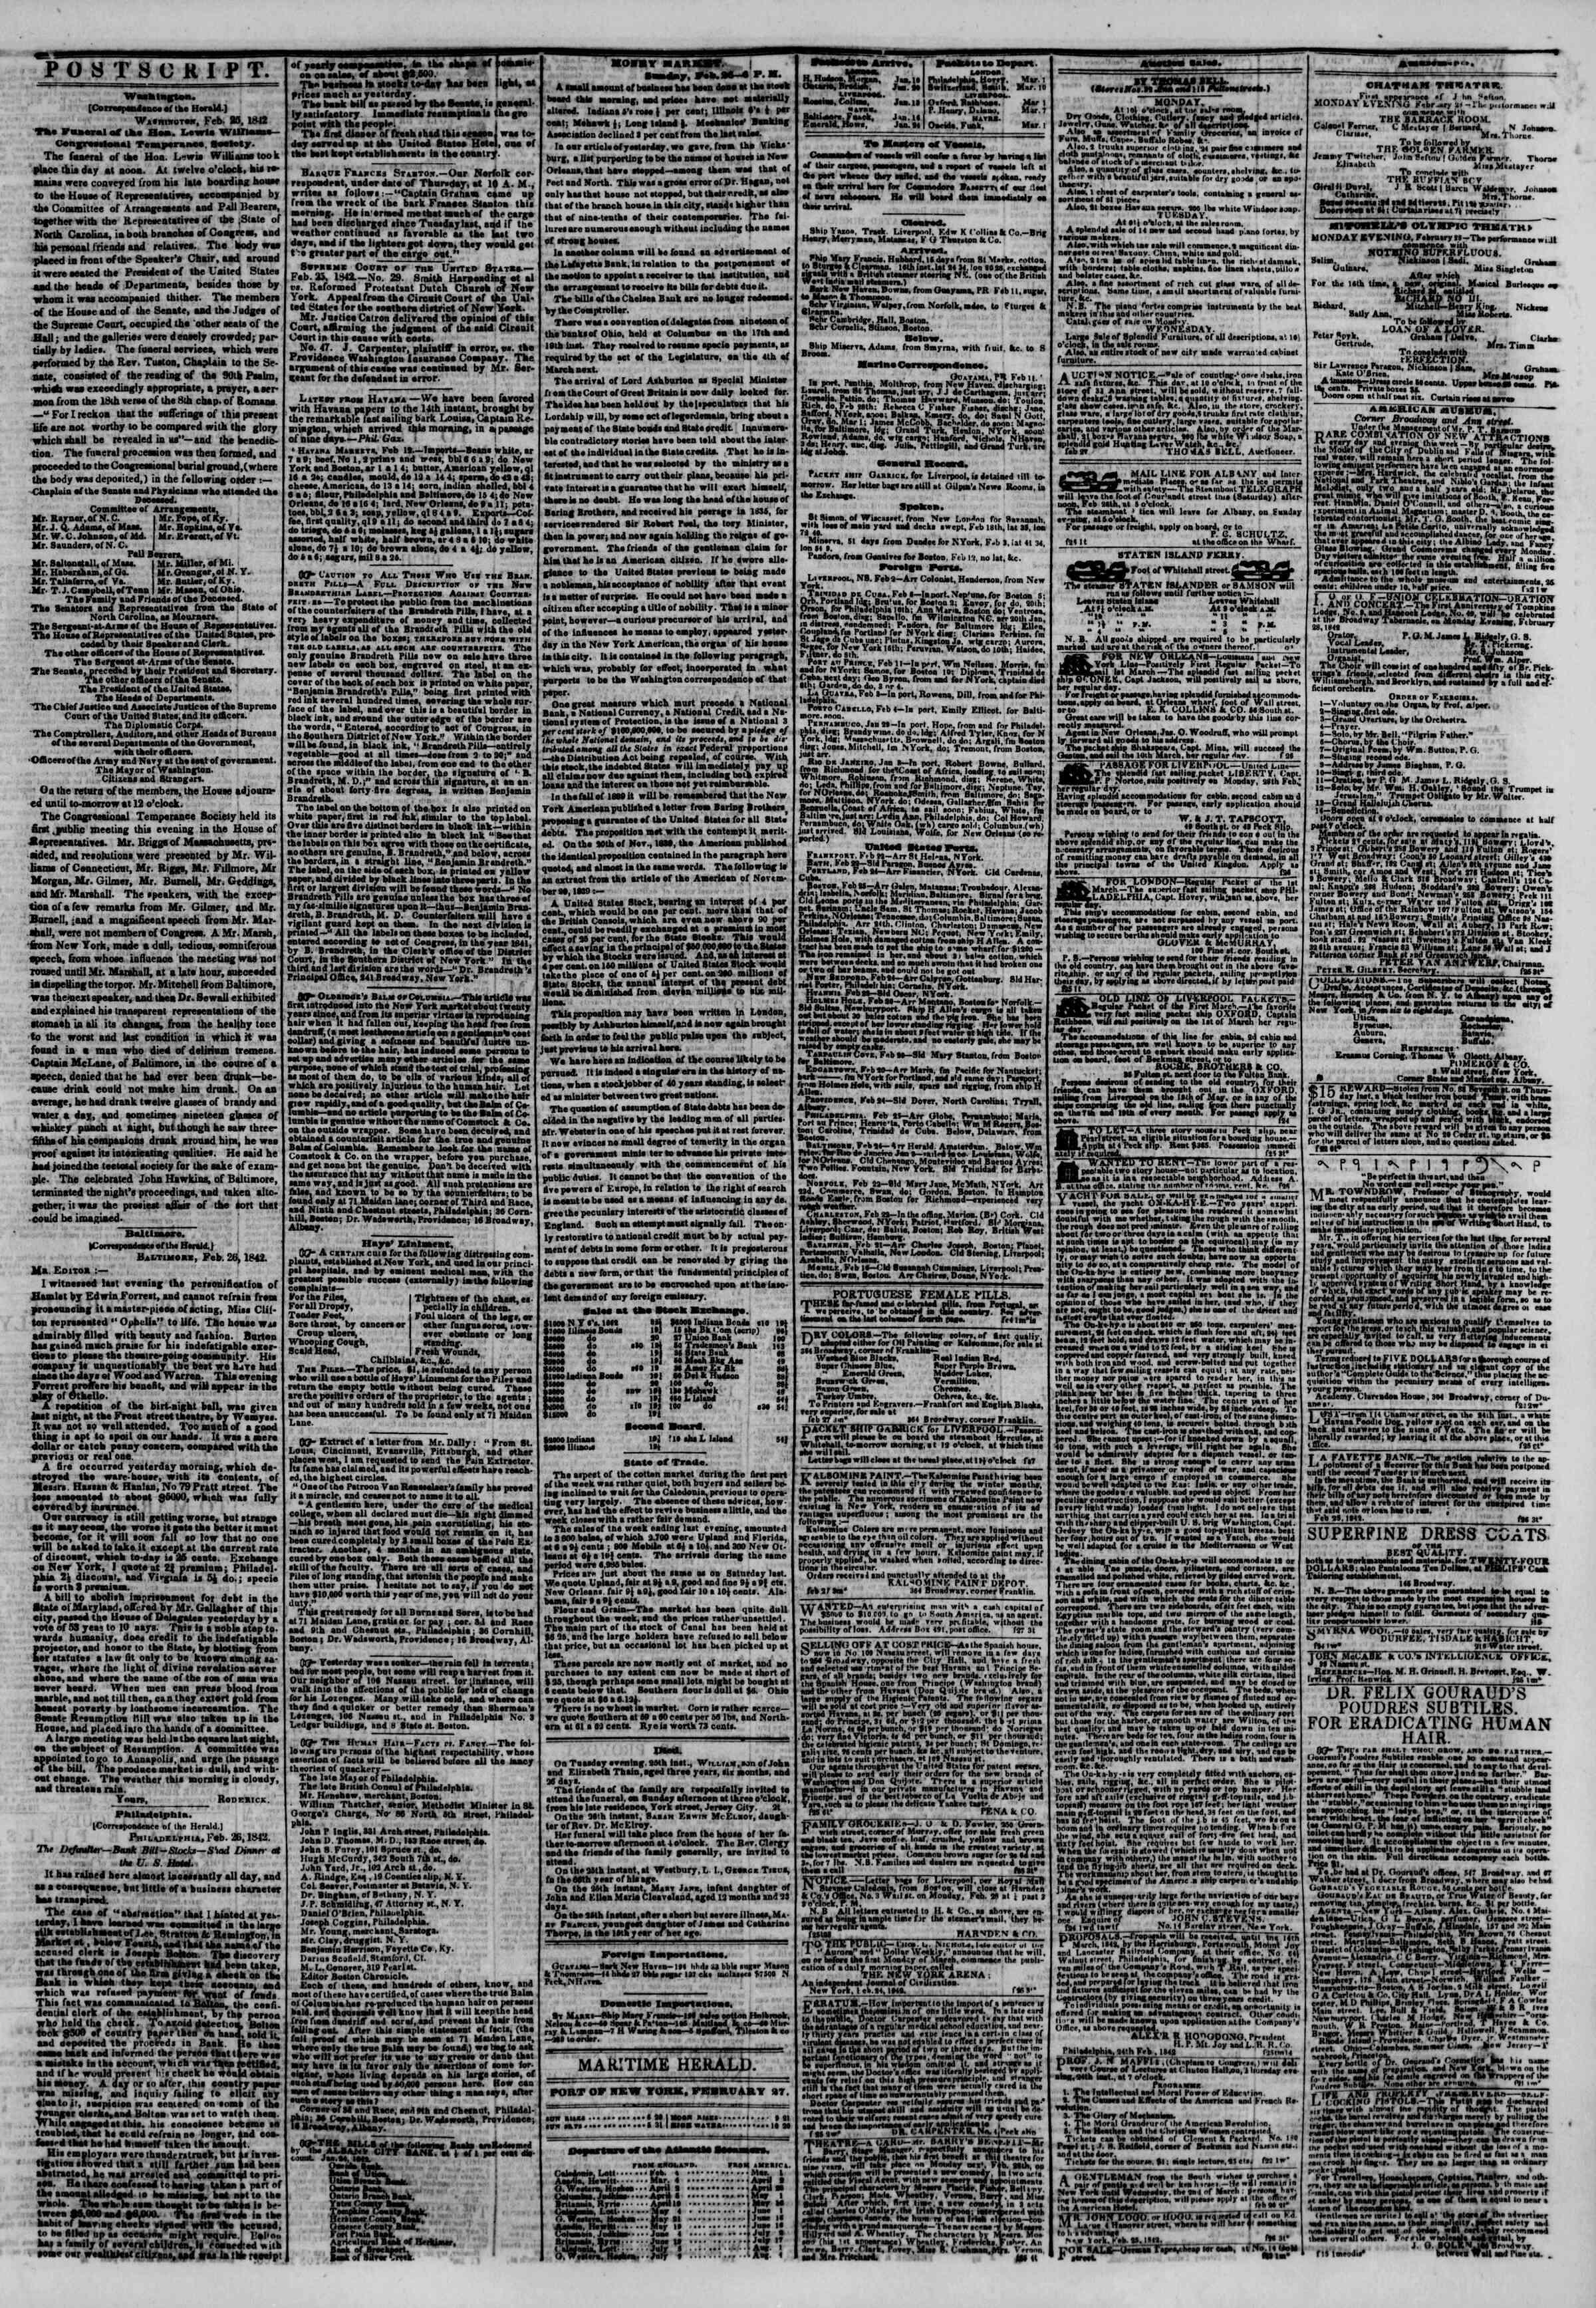 February 27, 1842 Tarihli The New York Herald Gazetesi Sayfa 3